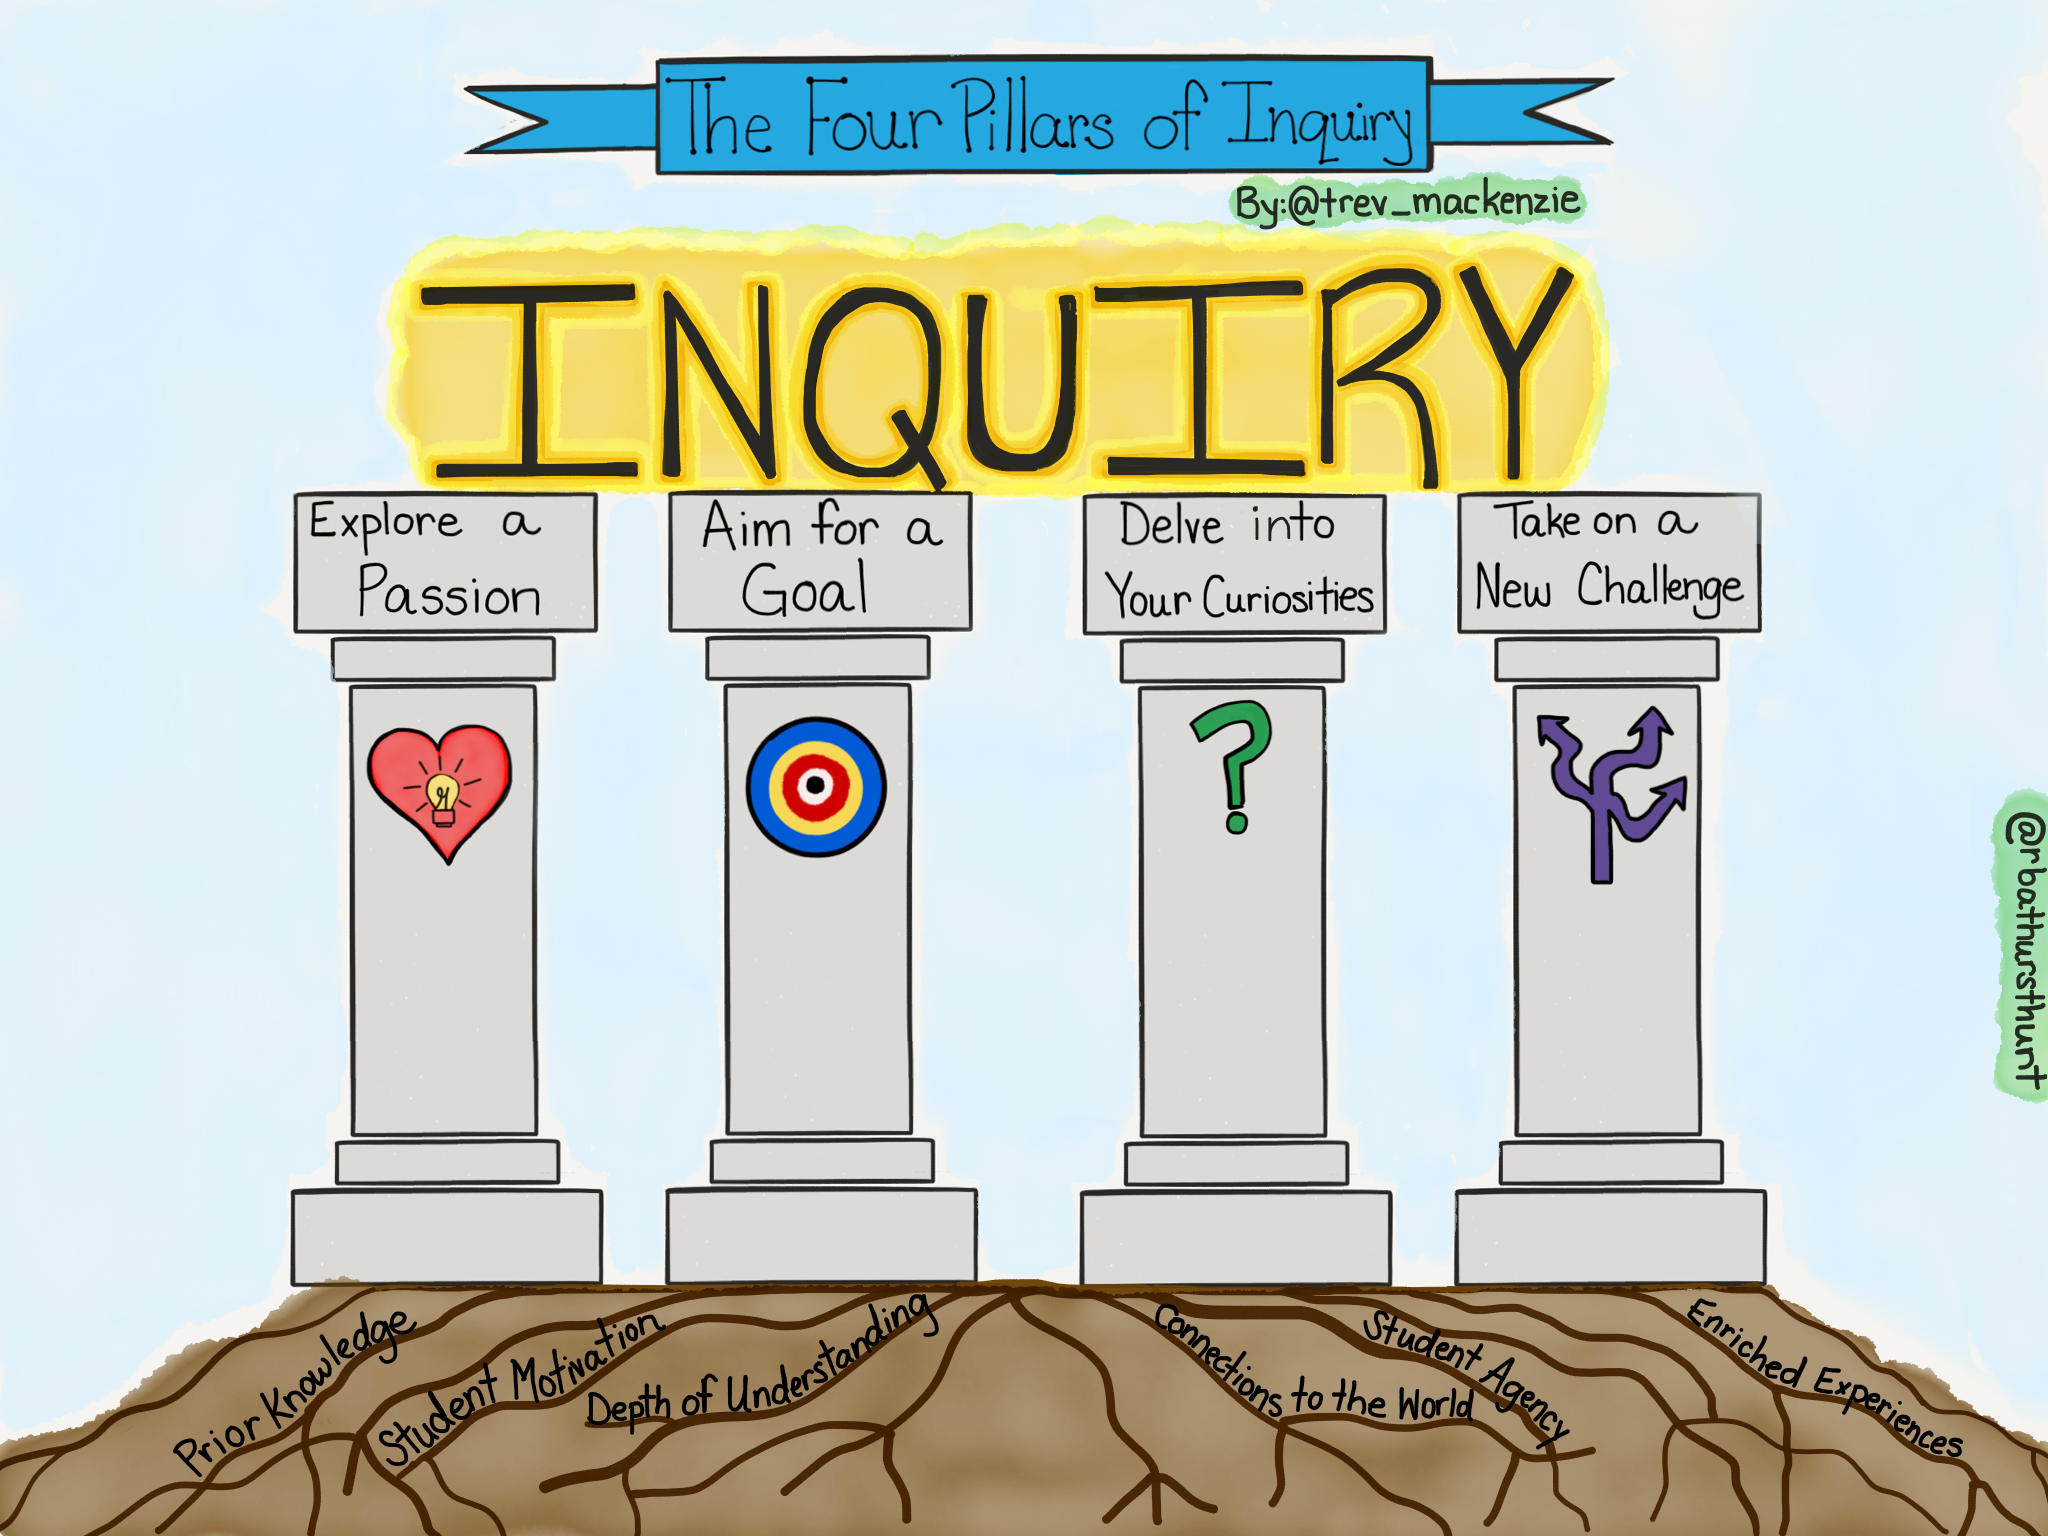 The Four Pillars of Inquiry by Trevor MacKenzie and Rebecca Bathurst-Hunt